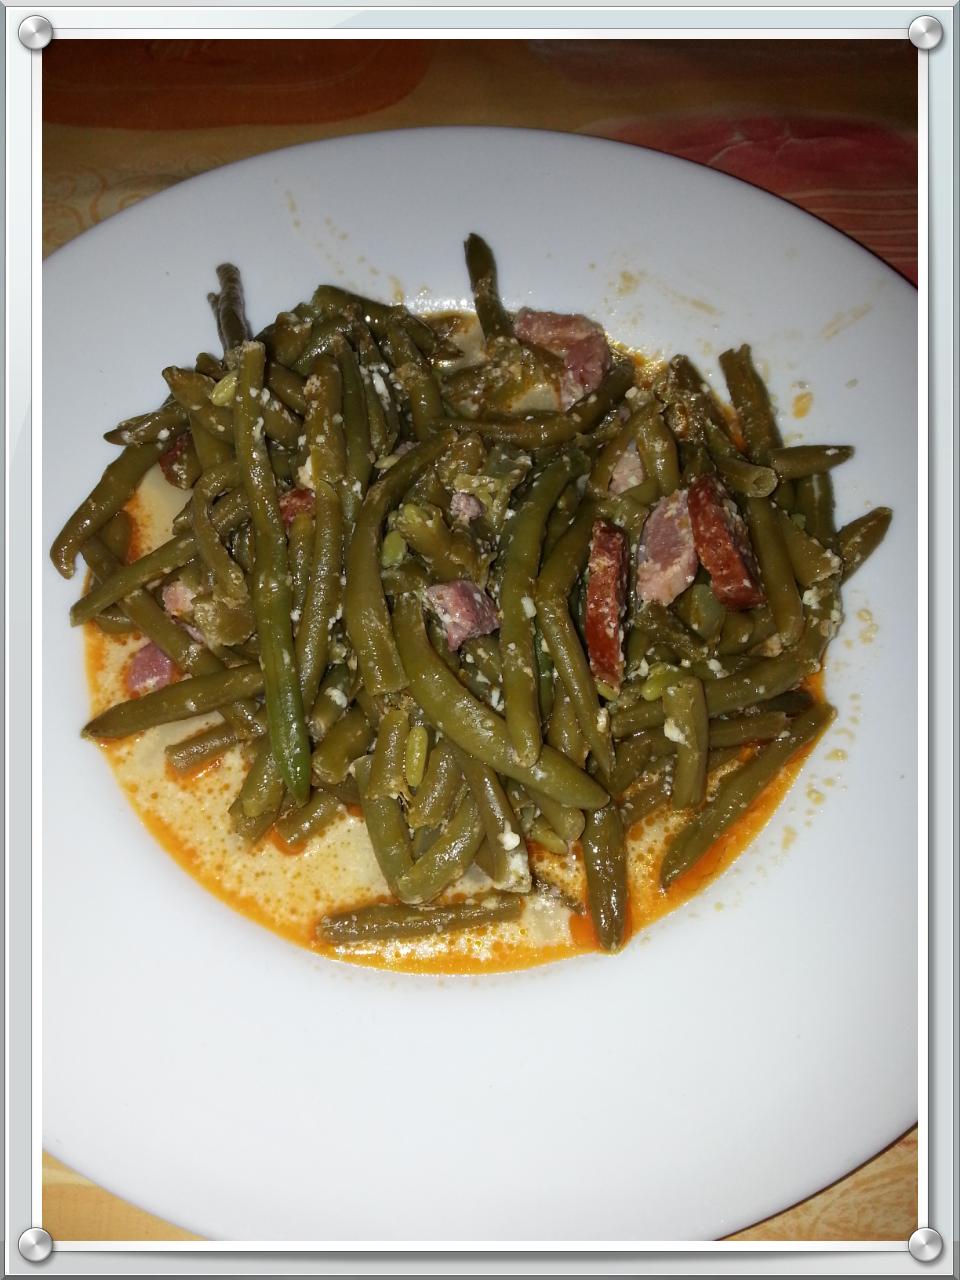 D lices d 39 haricot vert haricots verts cuisiner les - Cuisiner haricots verts surgeles ...